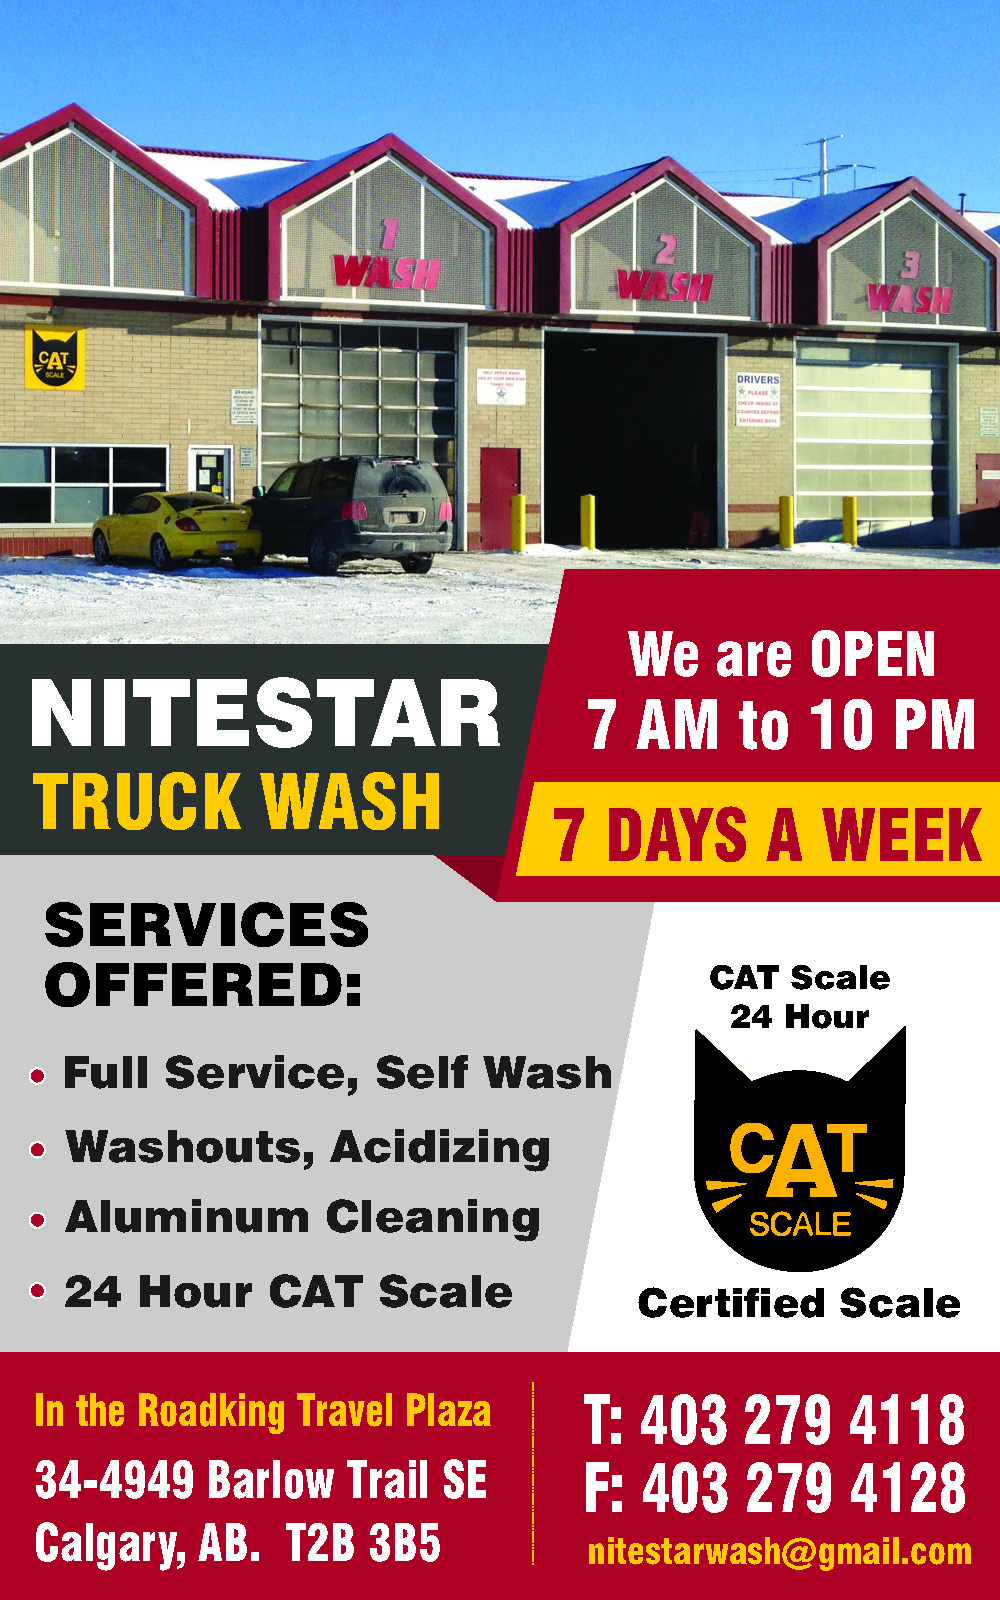 nitestar-truck-wash-HMkwIXI.jpeg